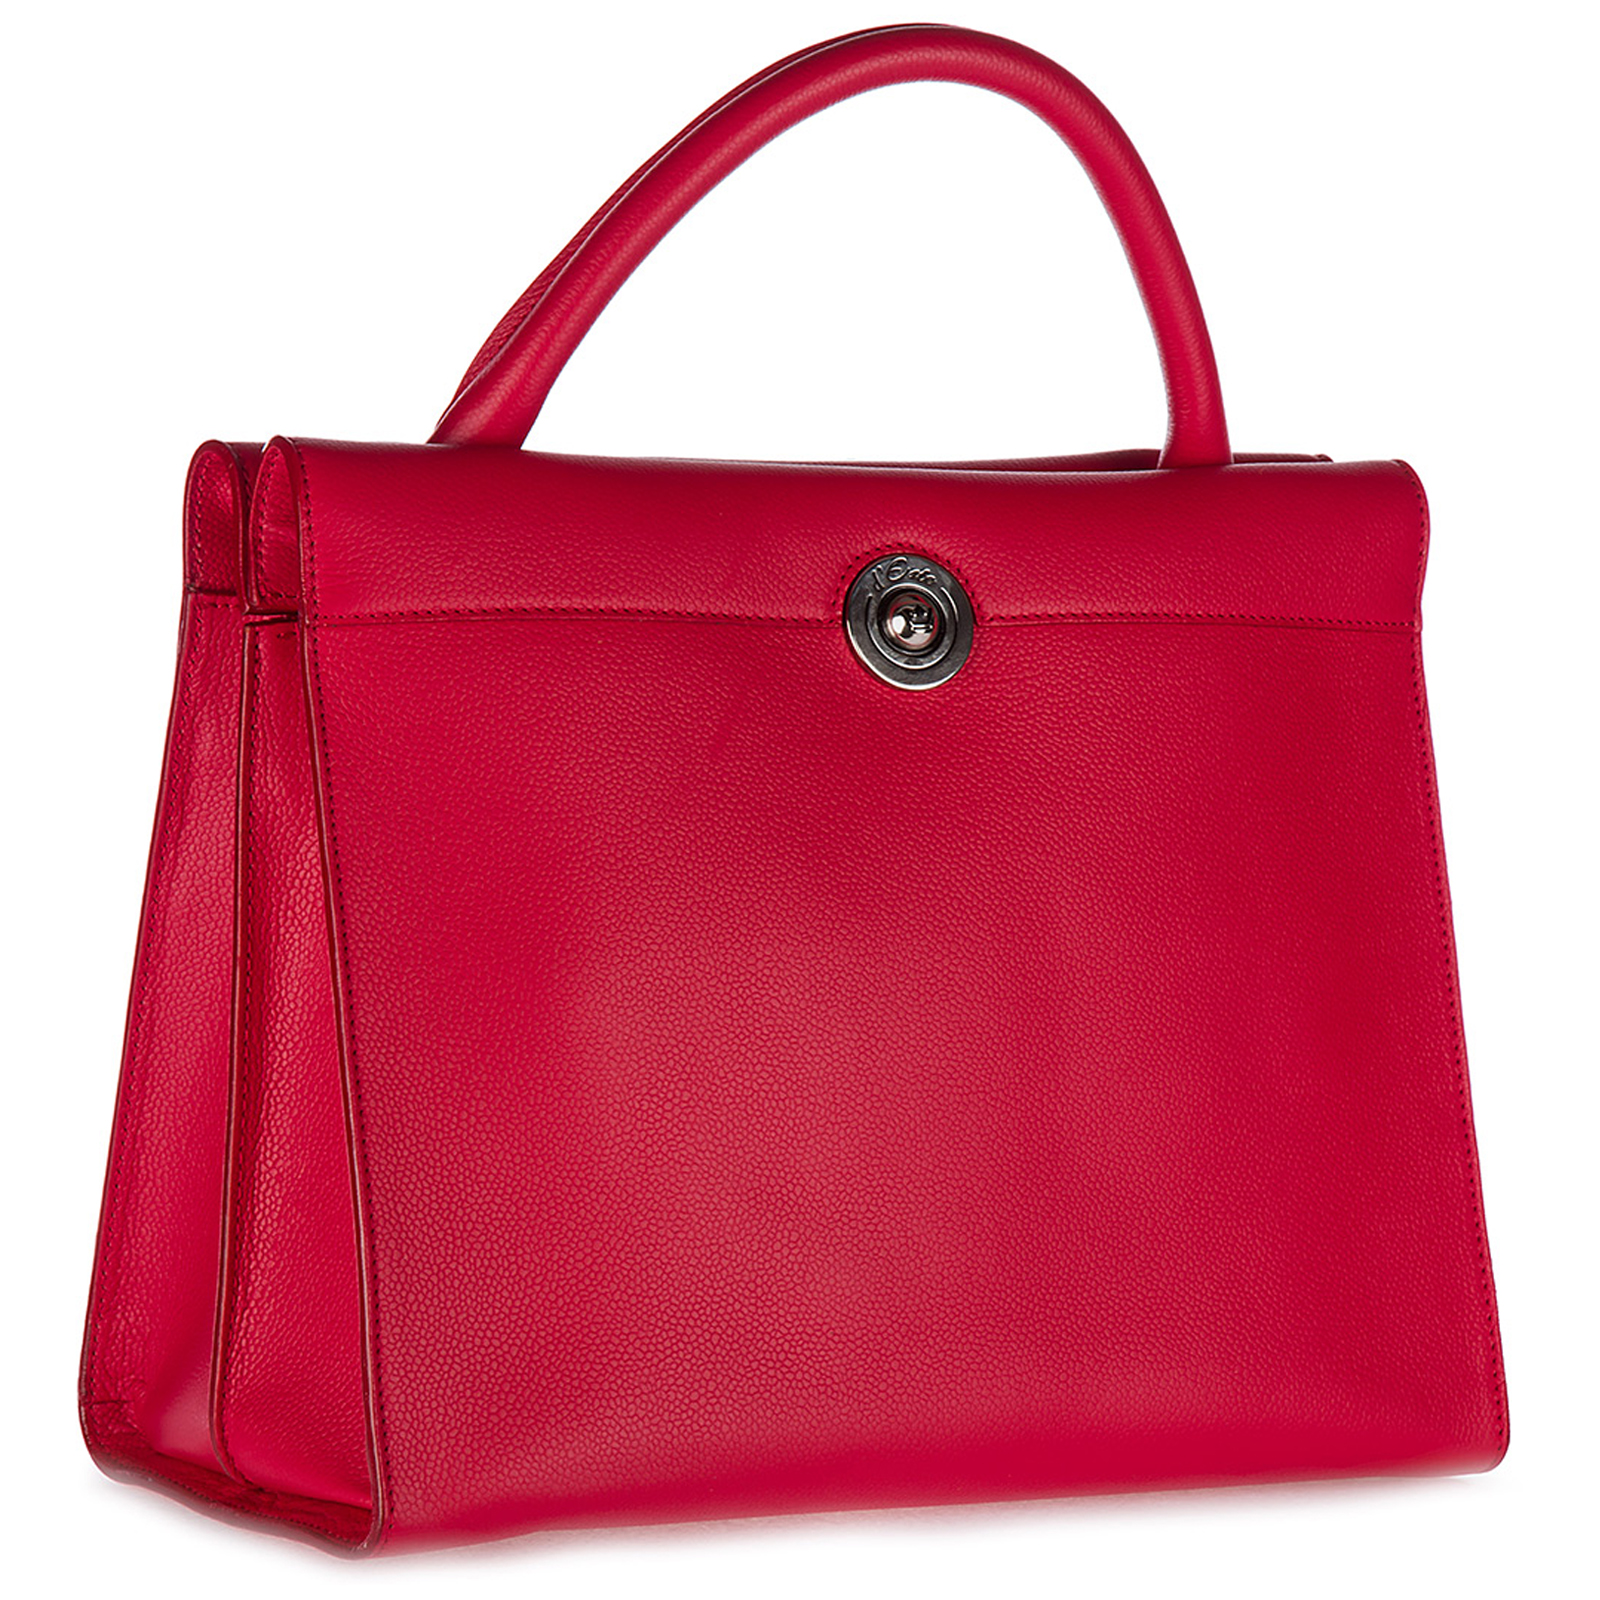 Leder handtasche damen tasche bag paris